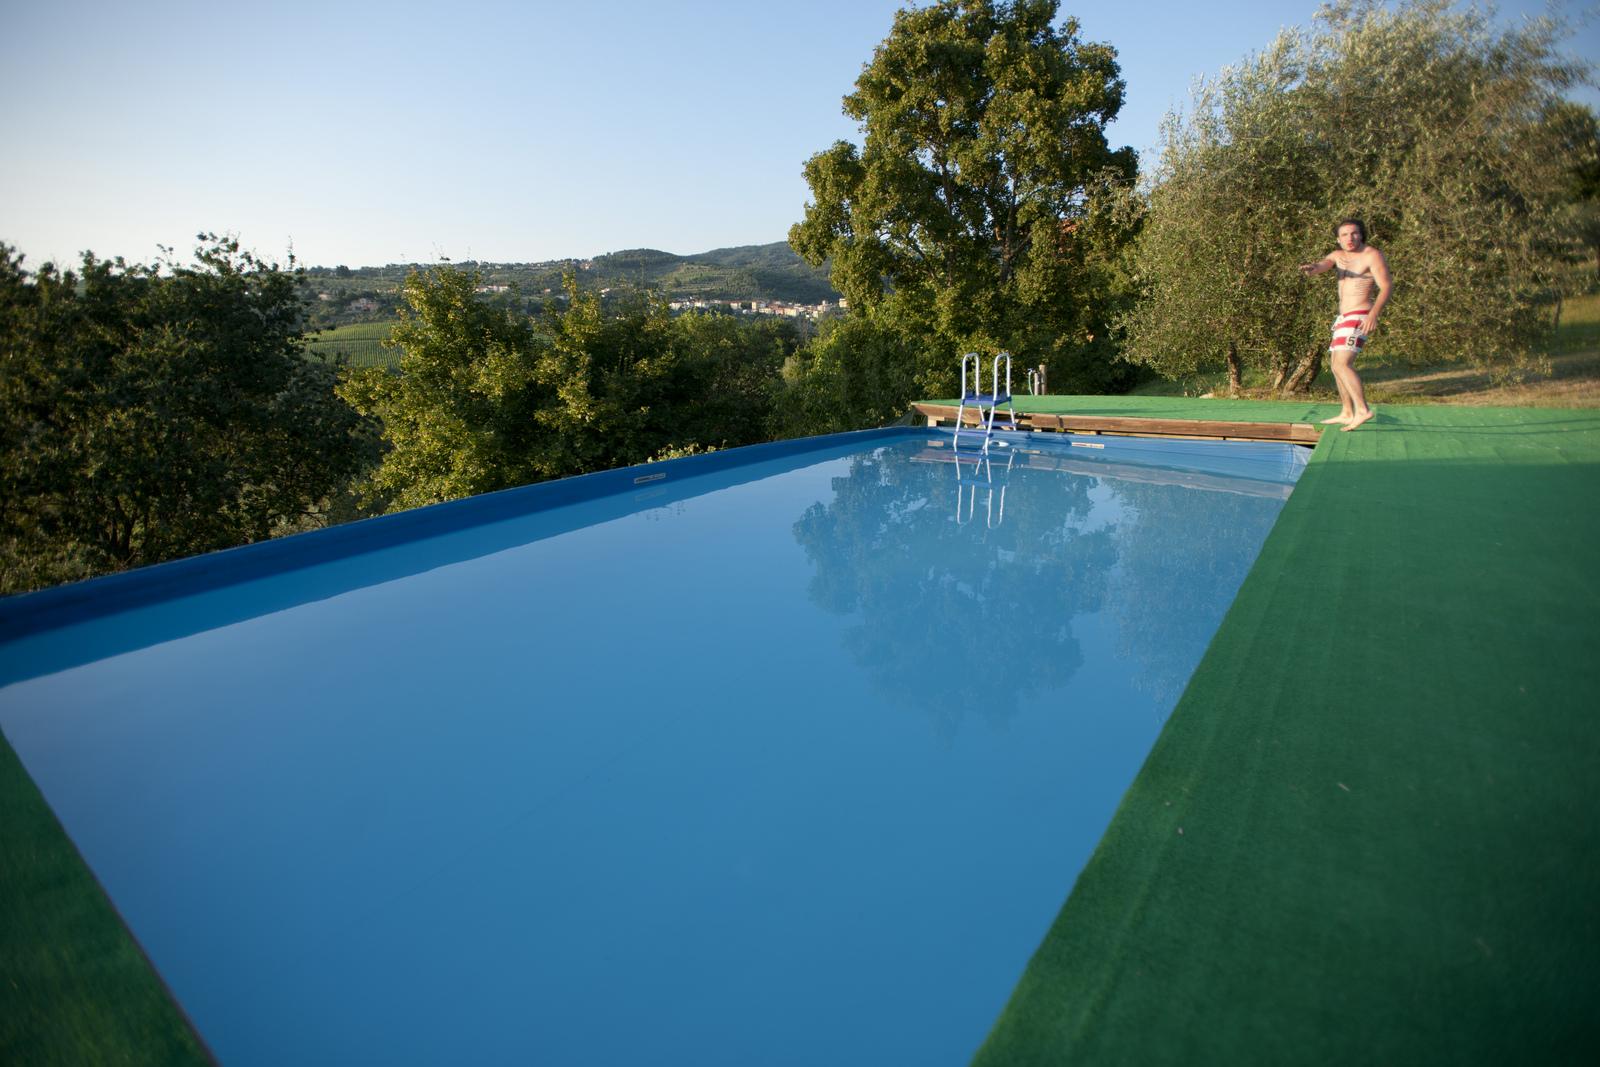 lpa_piscina_02